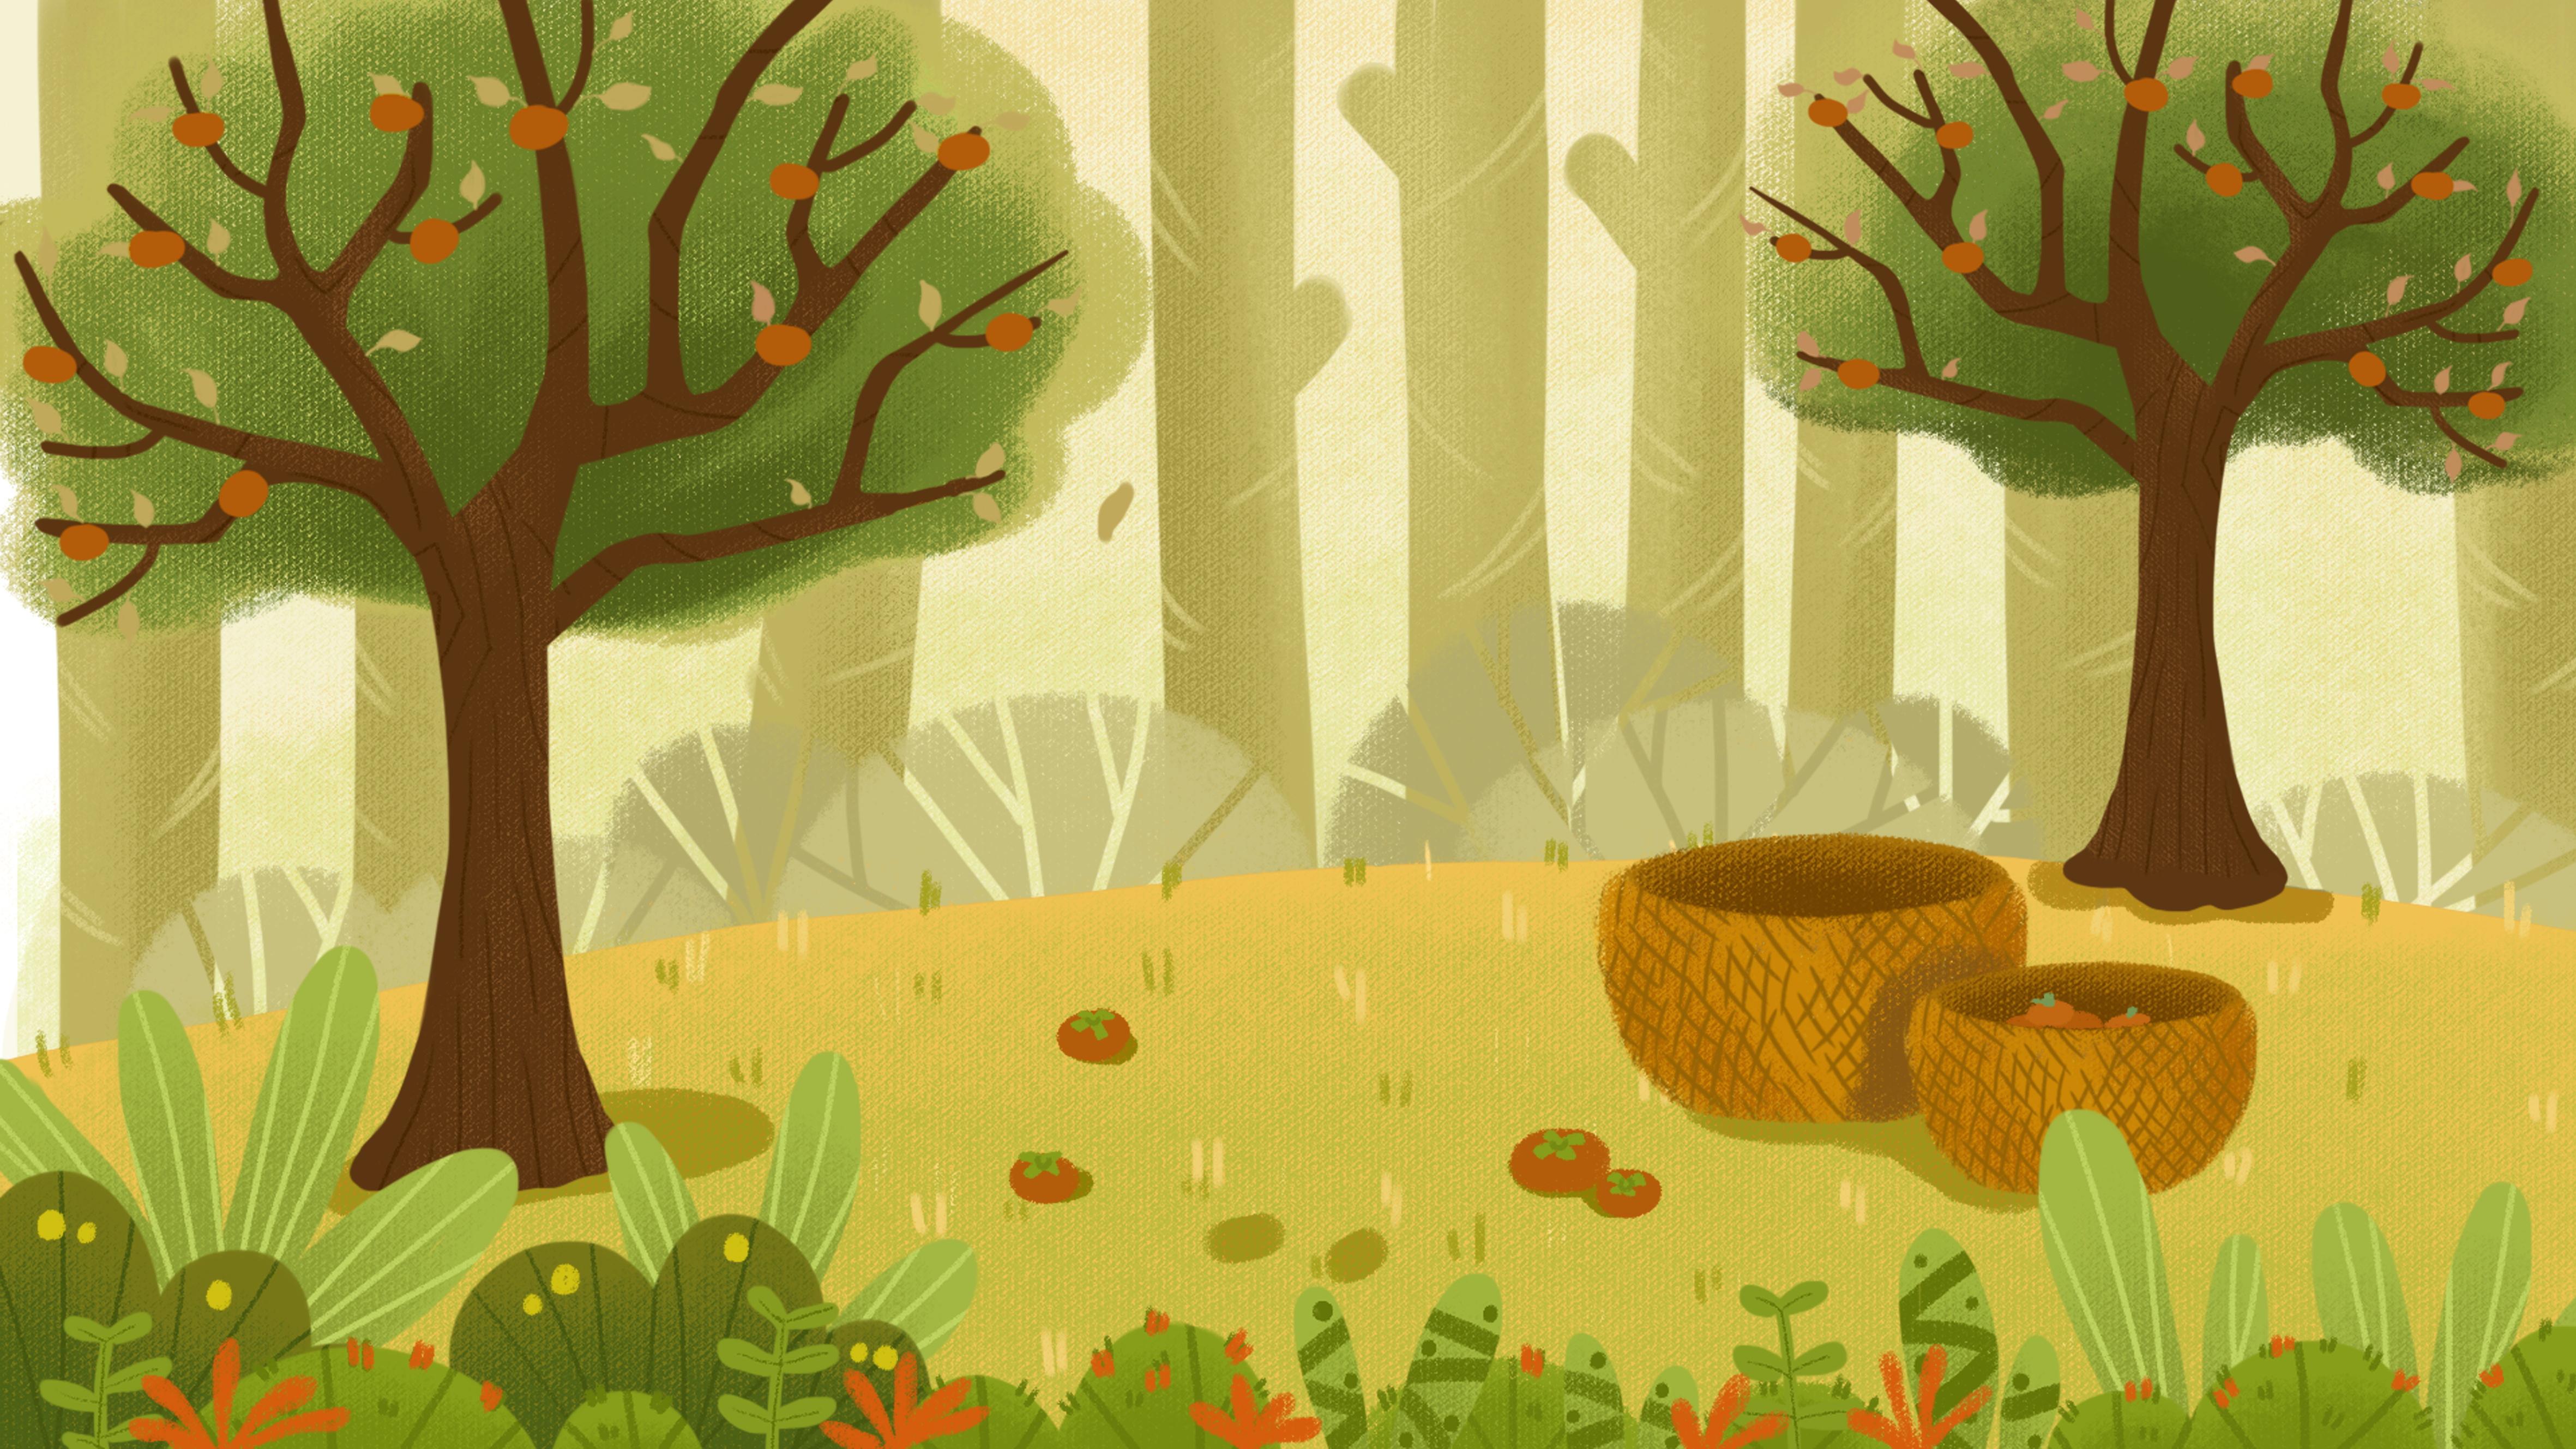 картинка для аппликации лес свету темноте